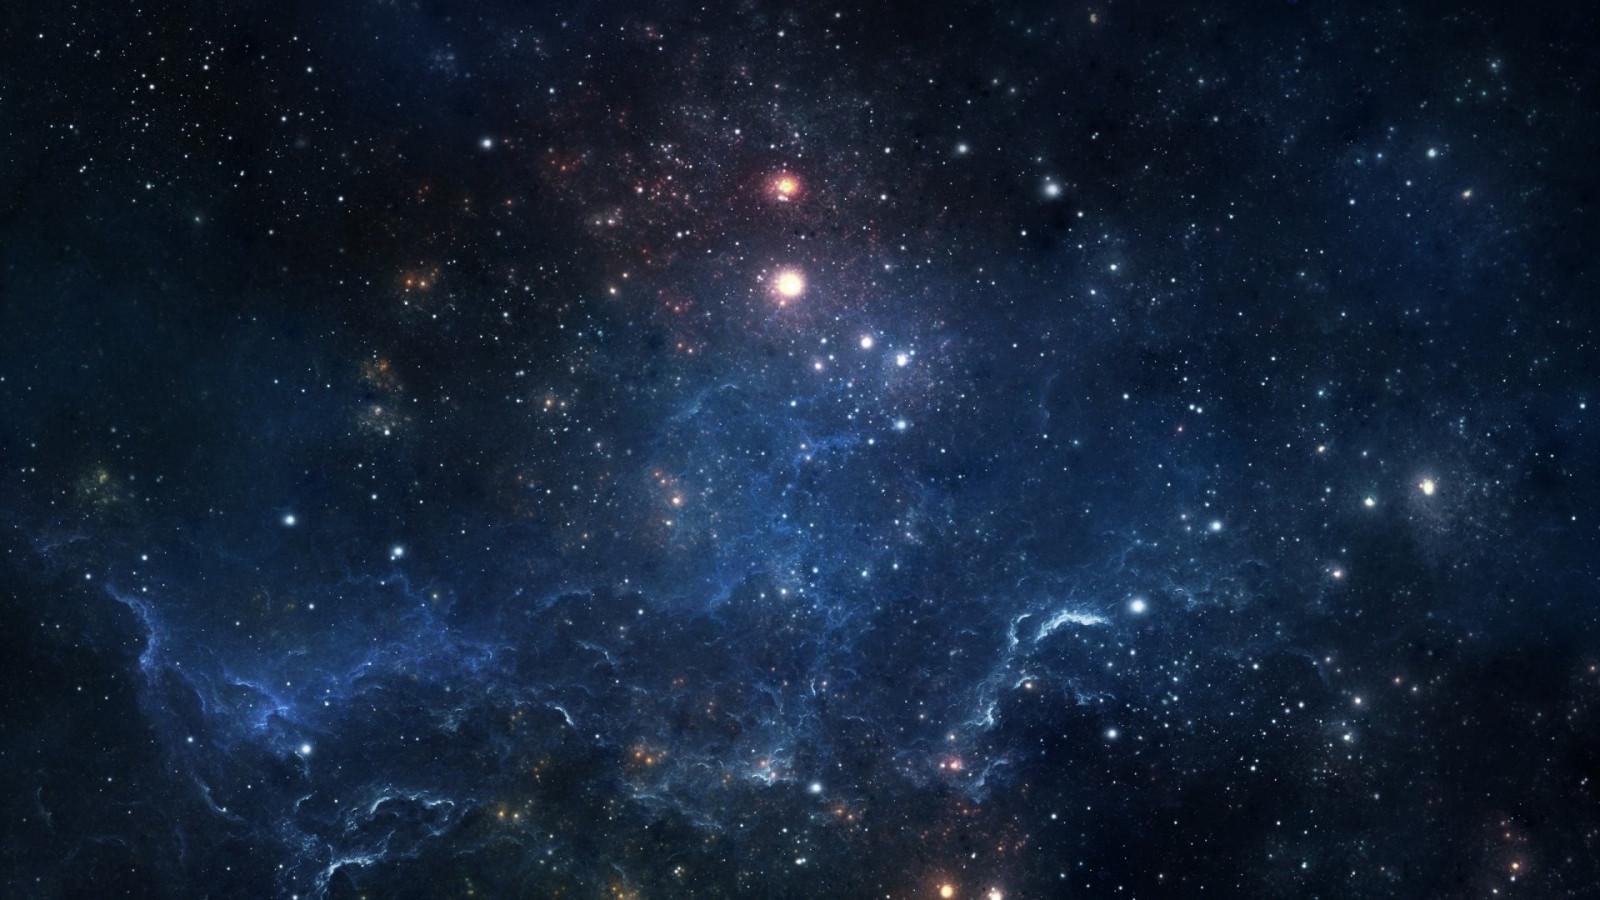 Звёздное небо и космос в картинках - Страница 40 Space_stars_nebula_galaxy_space_art-14498